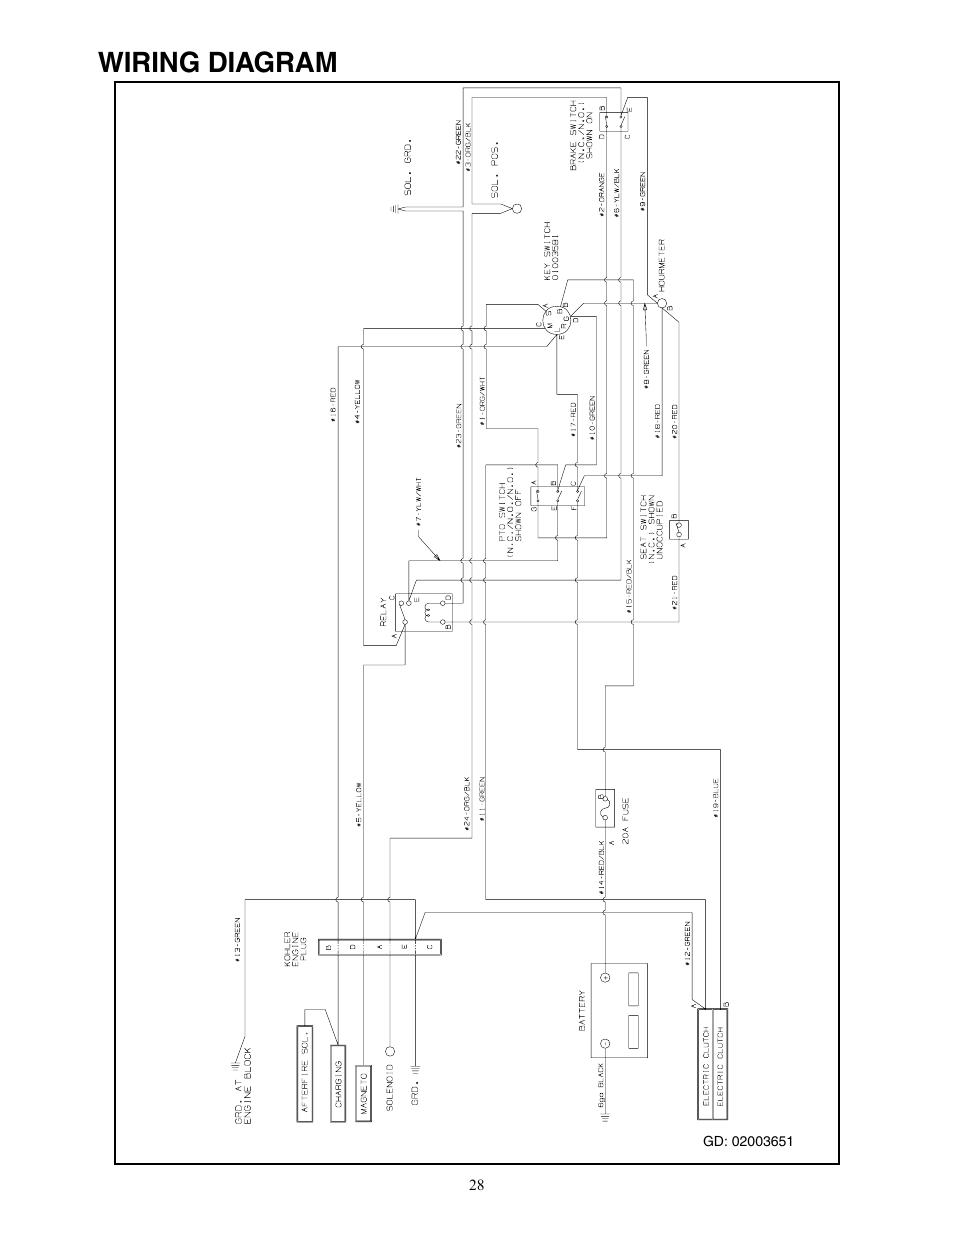 medium resolution of wiring diagram cub cadet 22hp enforcer 48 en user manual page 28 32